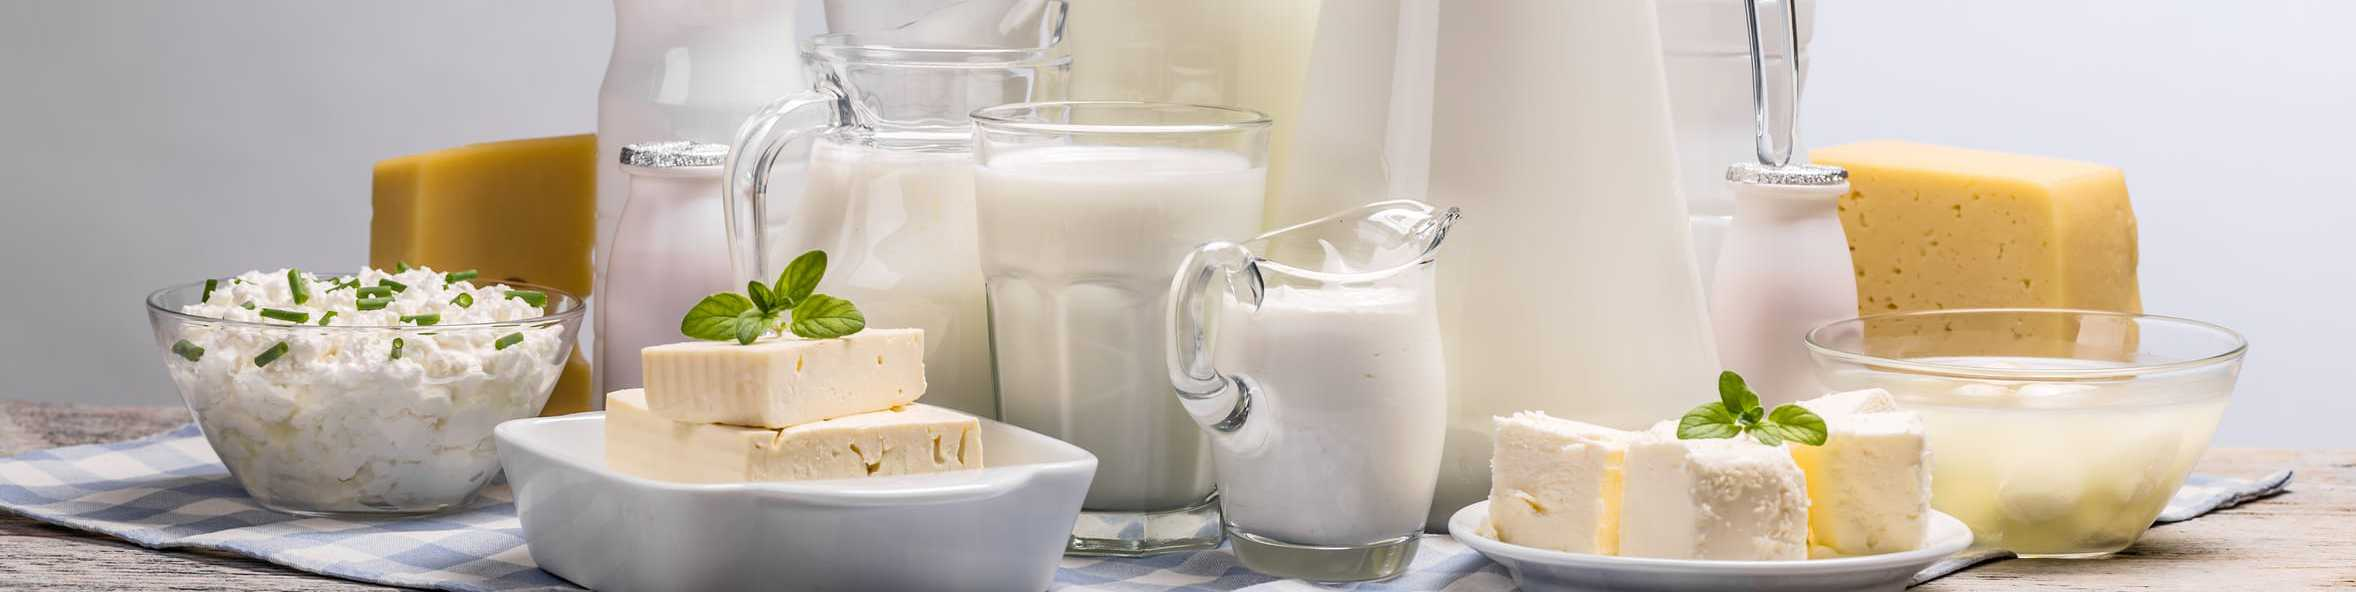 Milch, Käse,Quark,Frischkäse